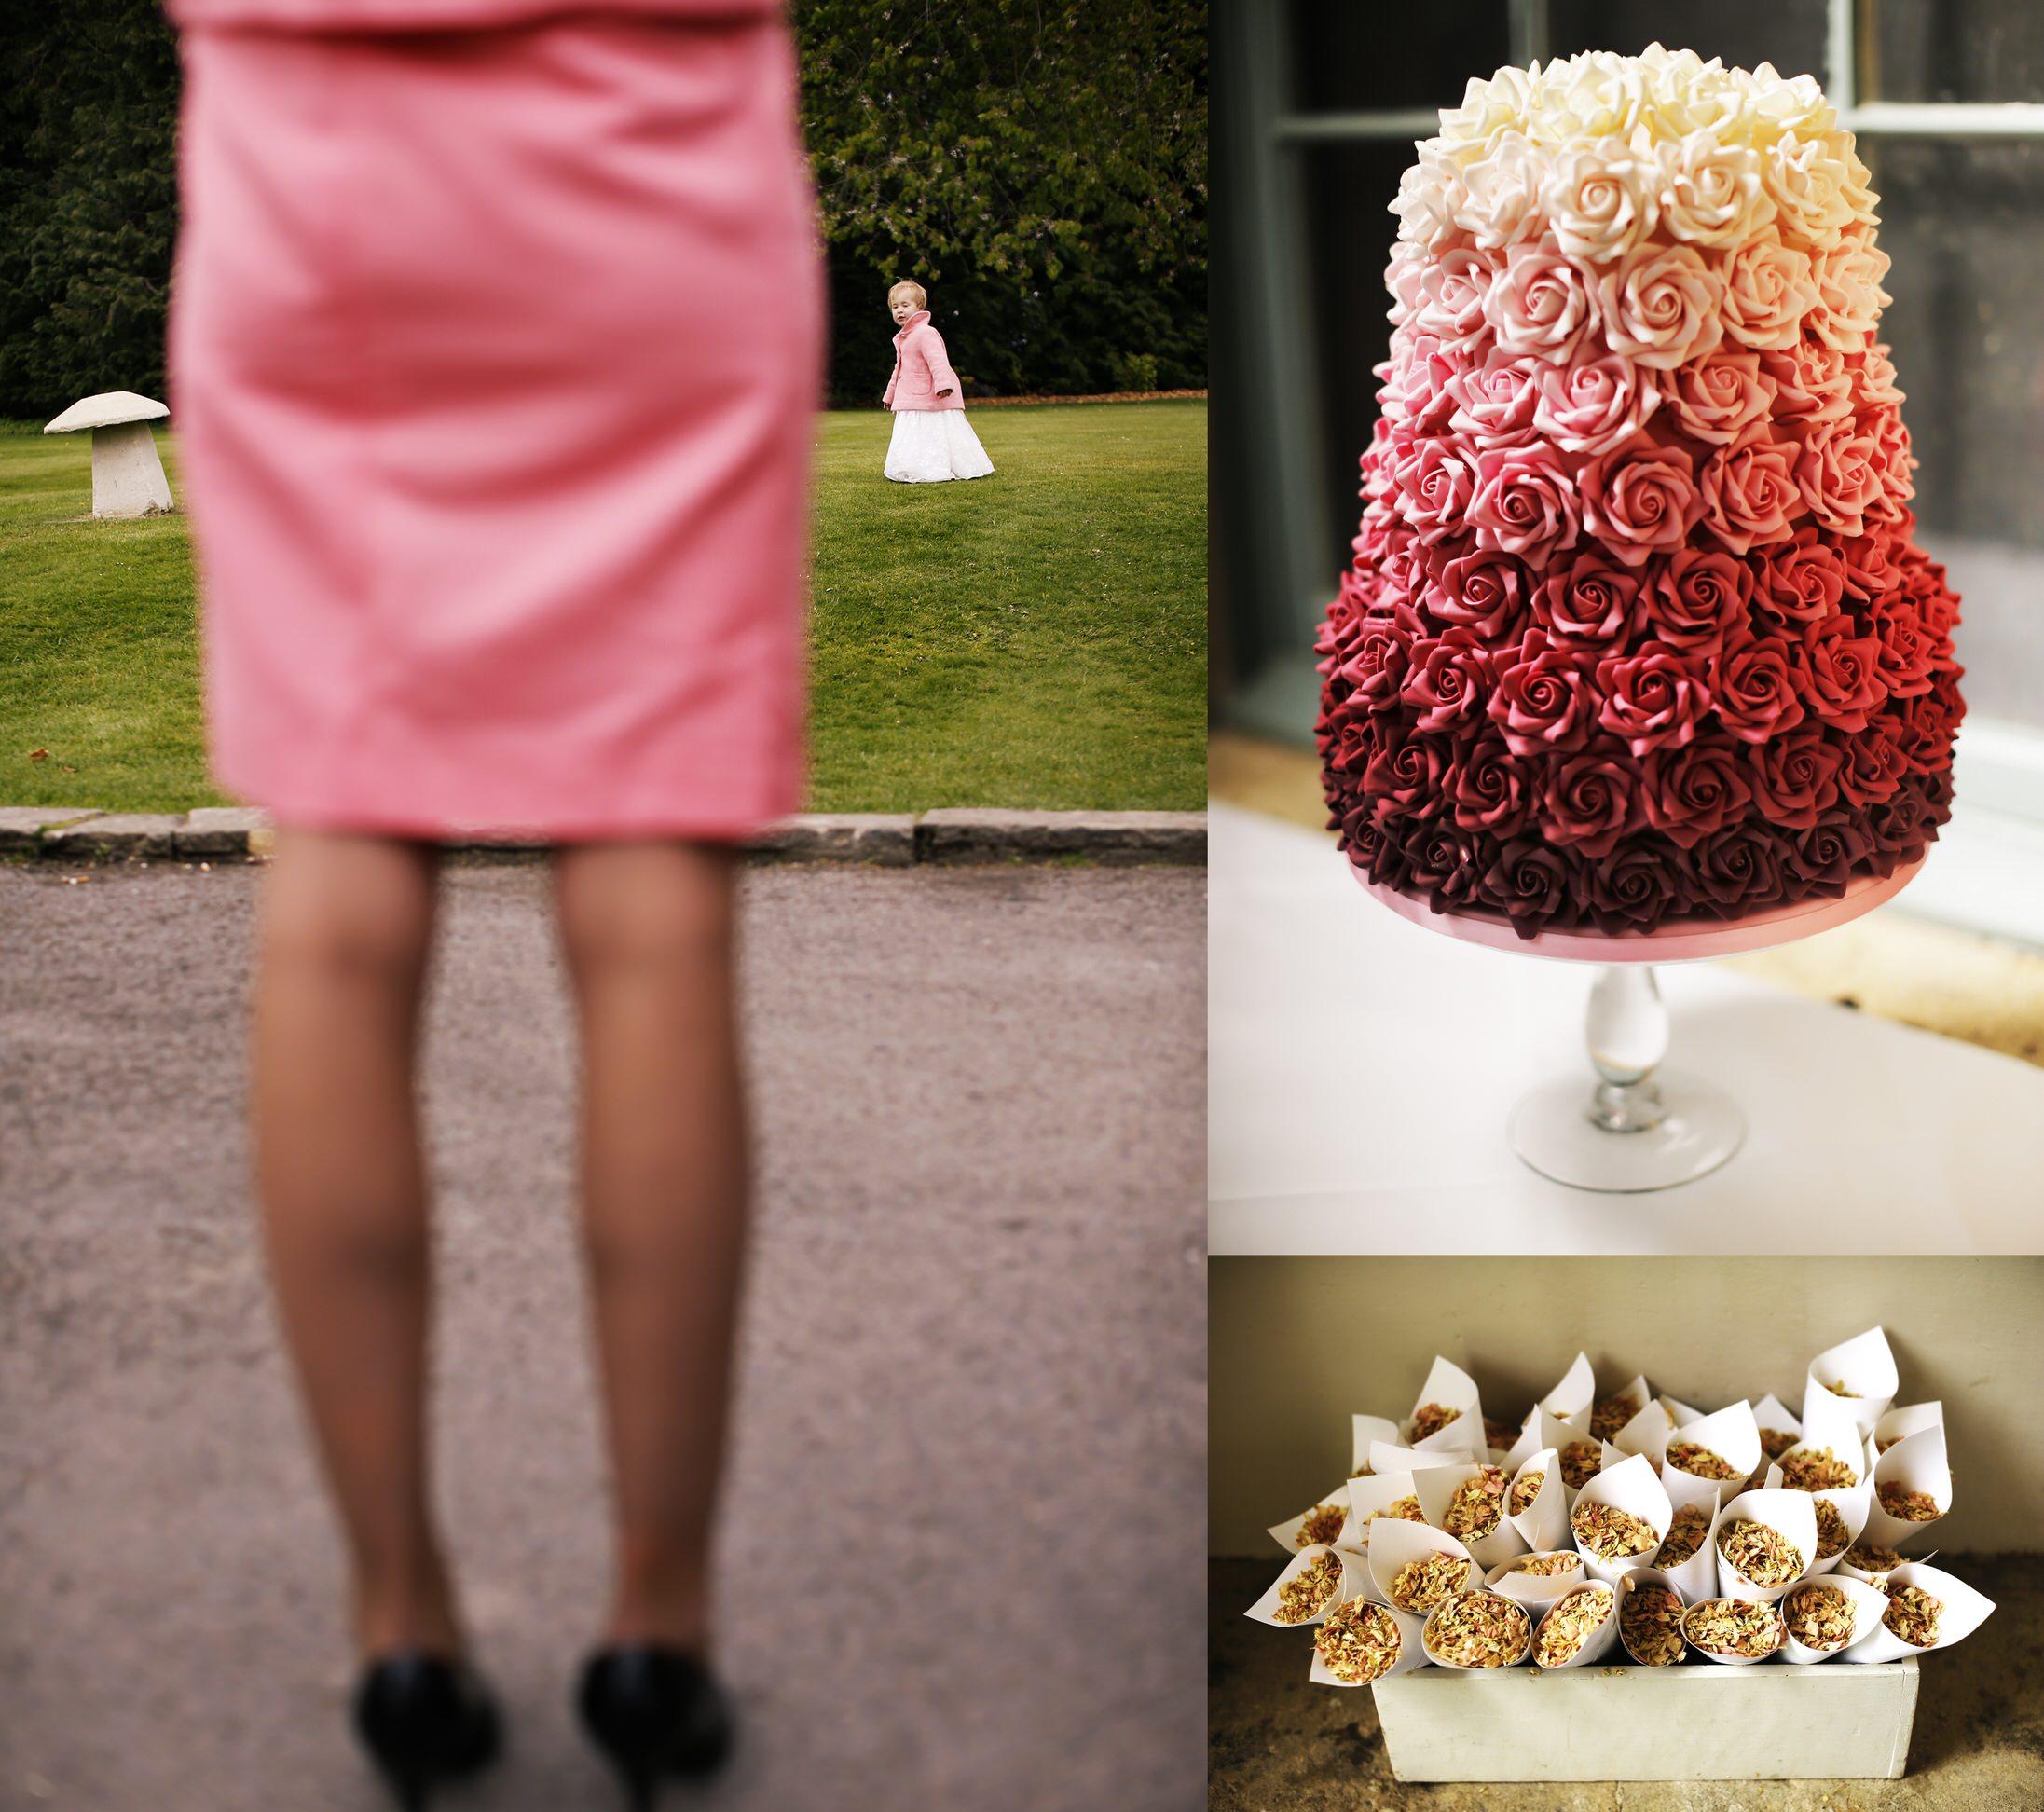 babington-house-wedding-at-soho-house-london-wedding-photographer_0006.jpg